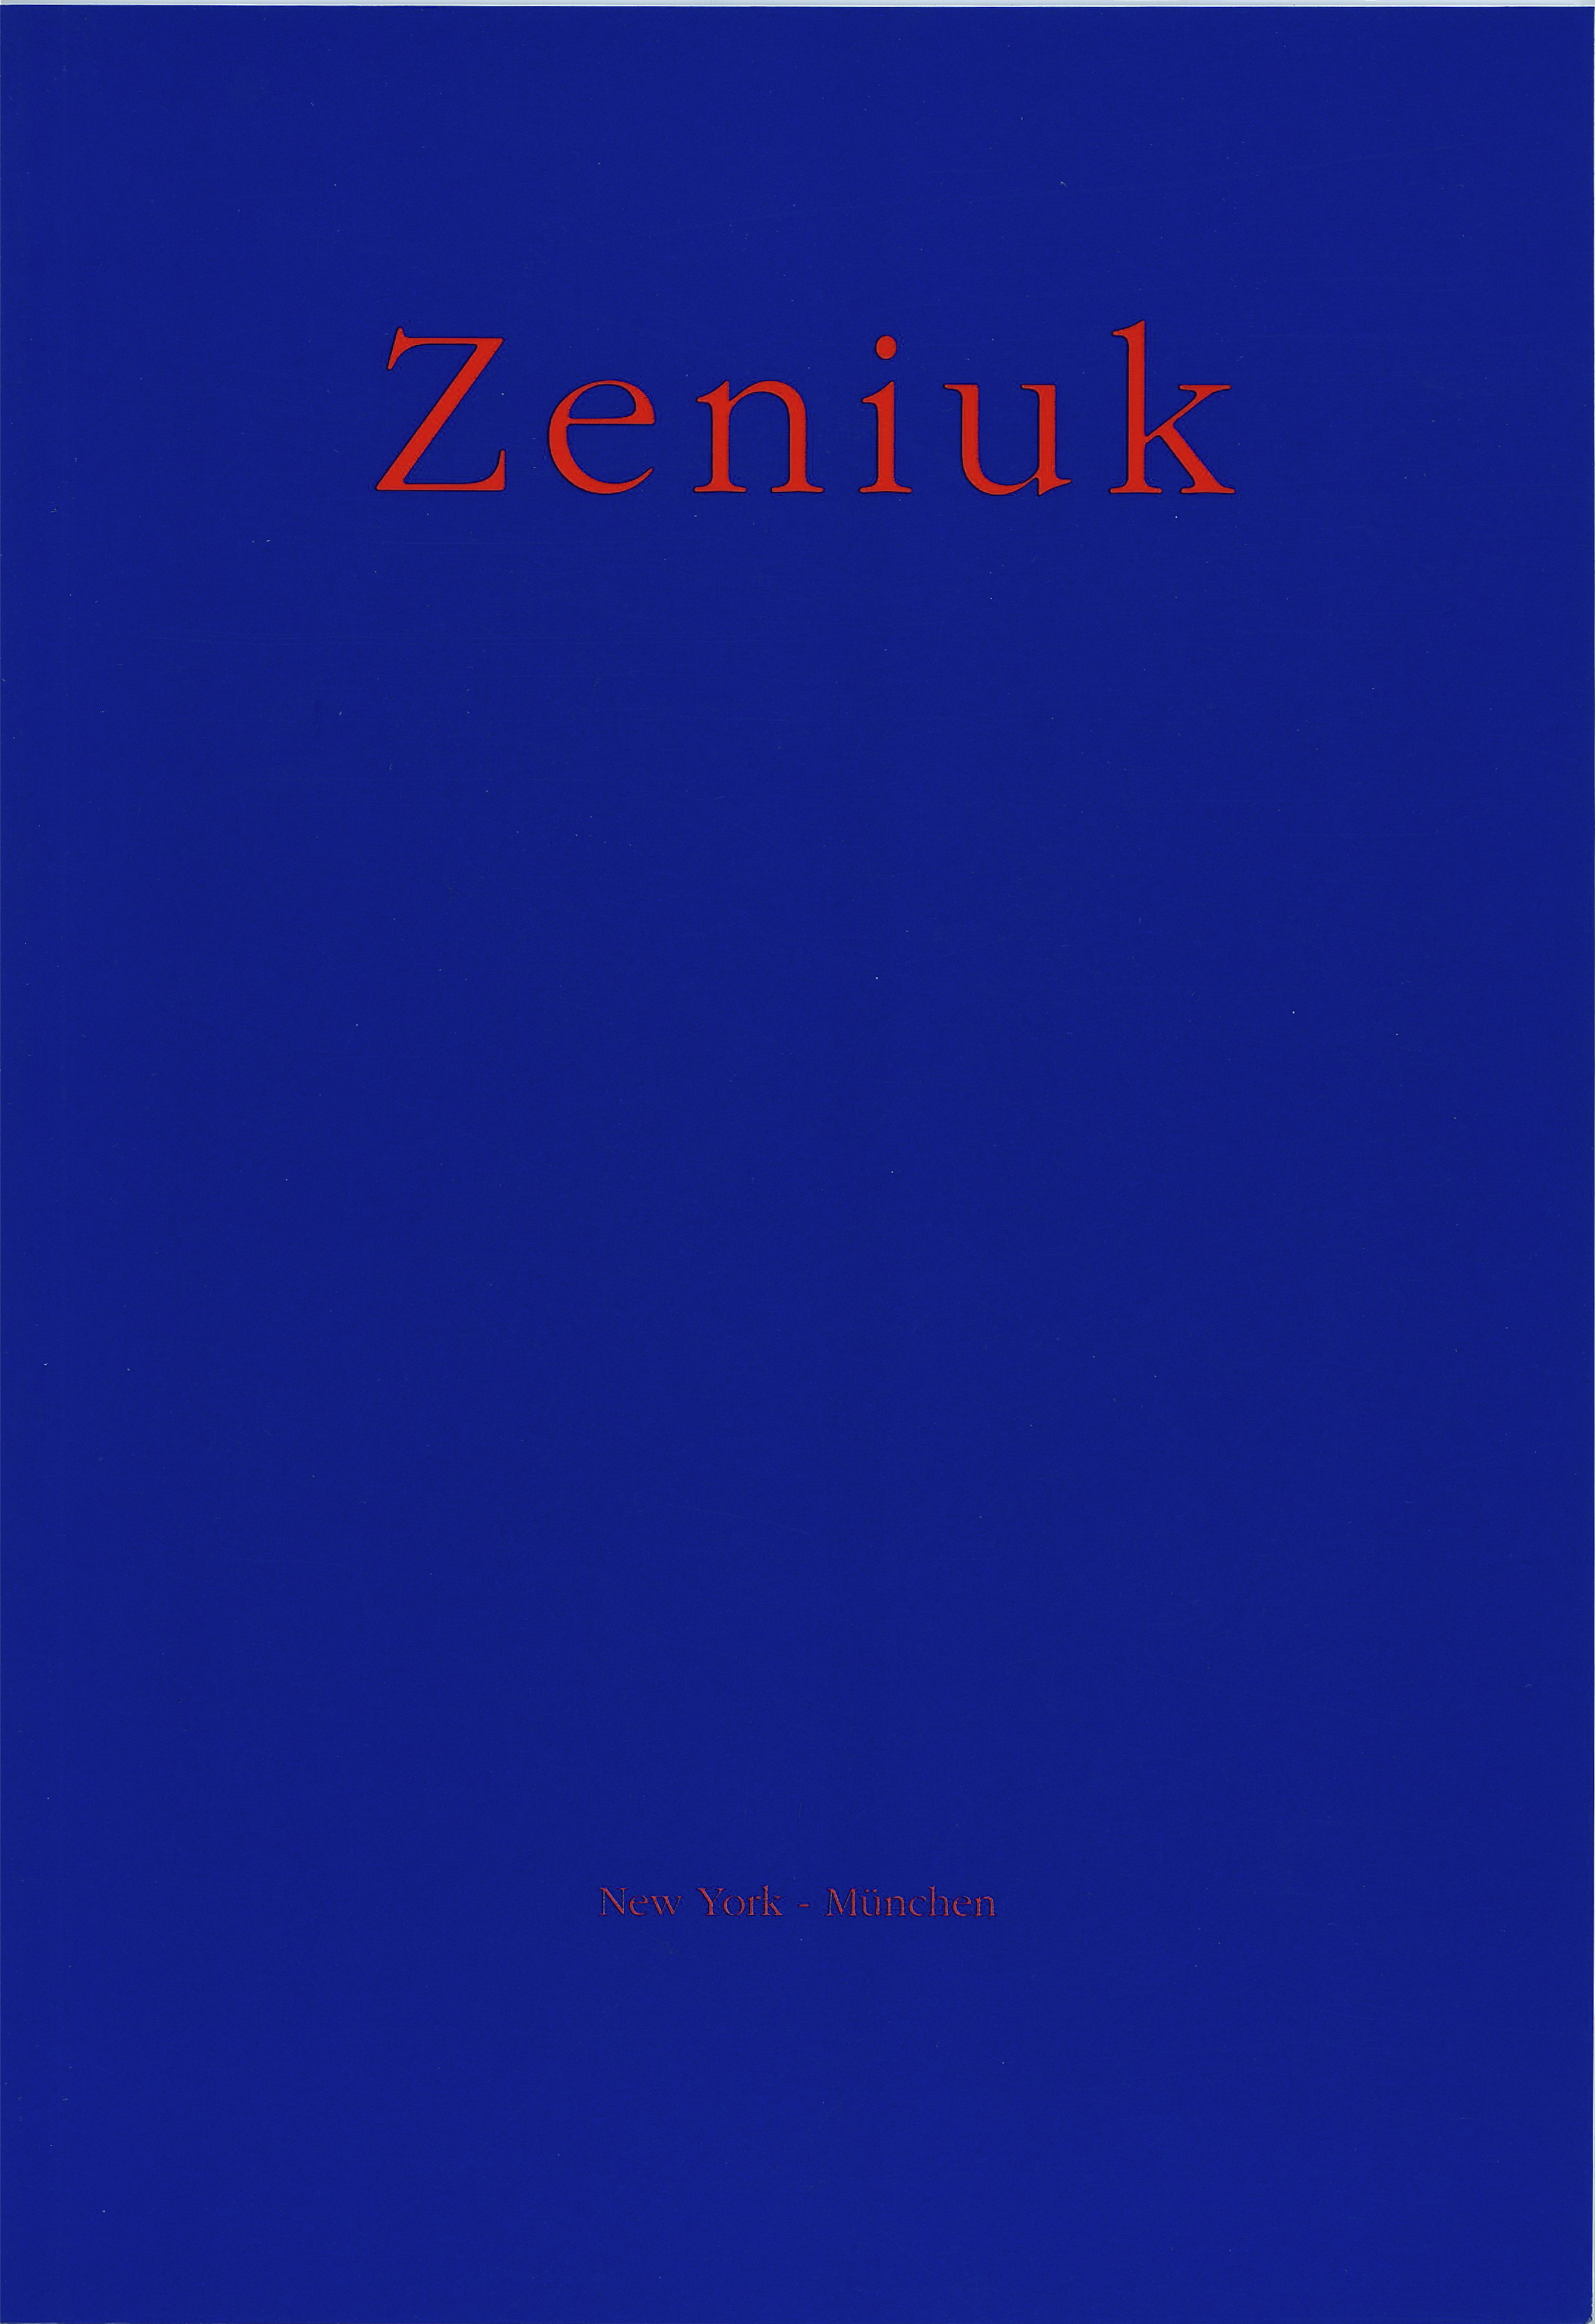 jerry-zeniuk-1996.jpg